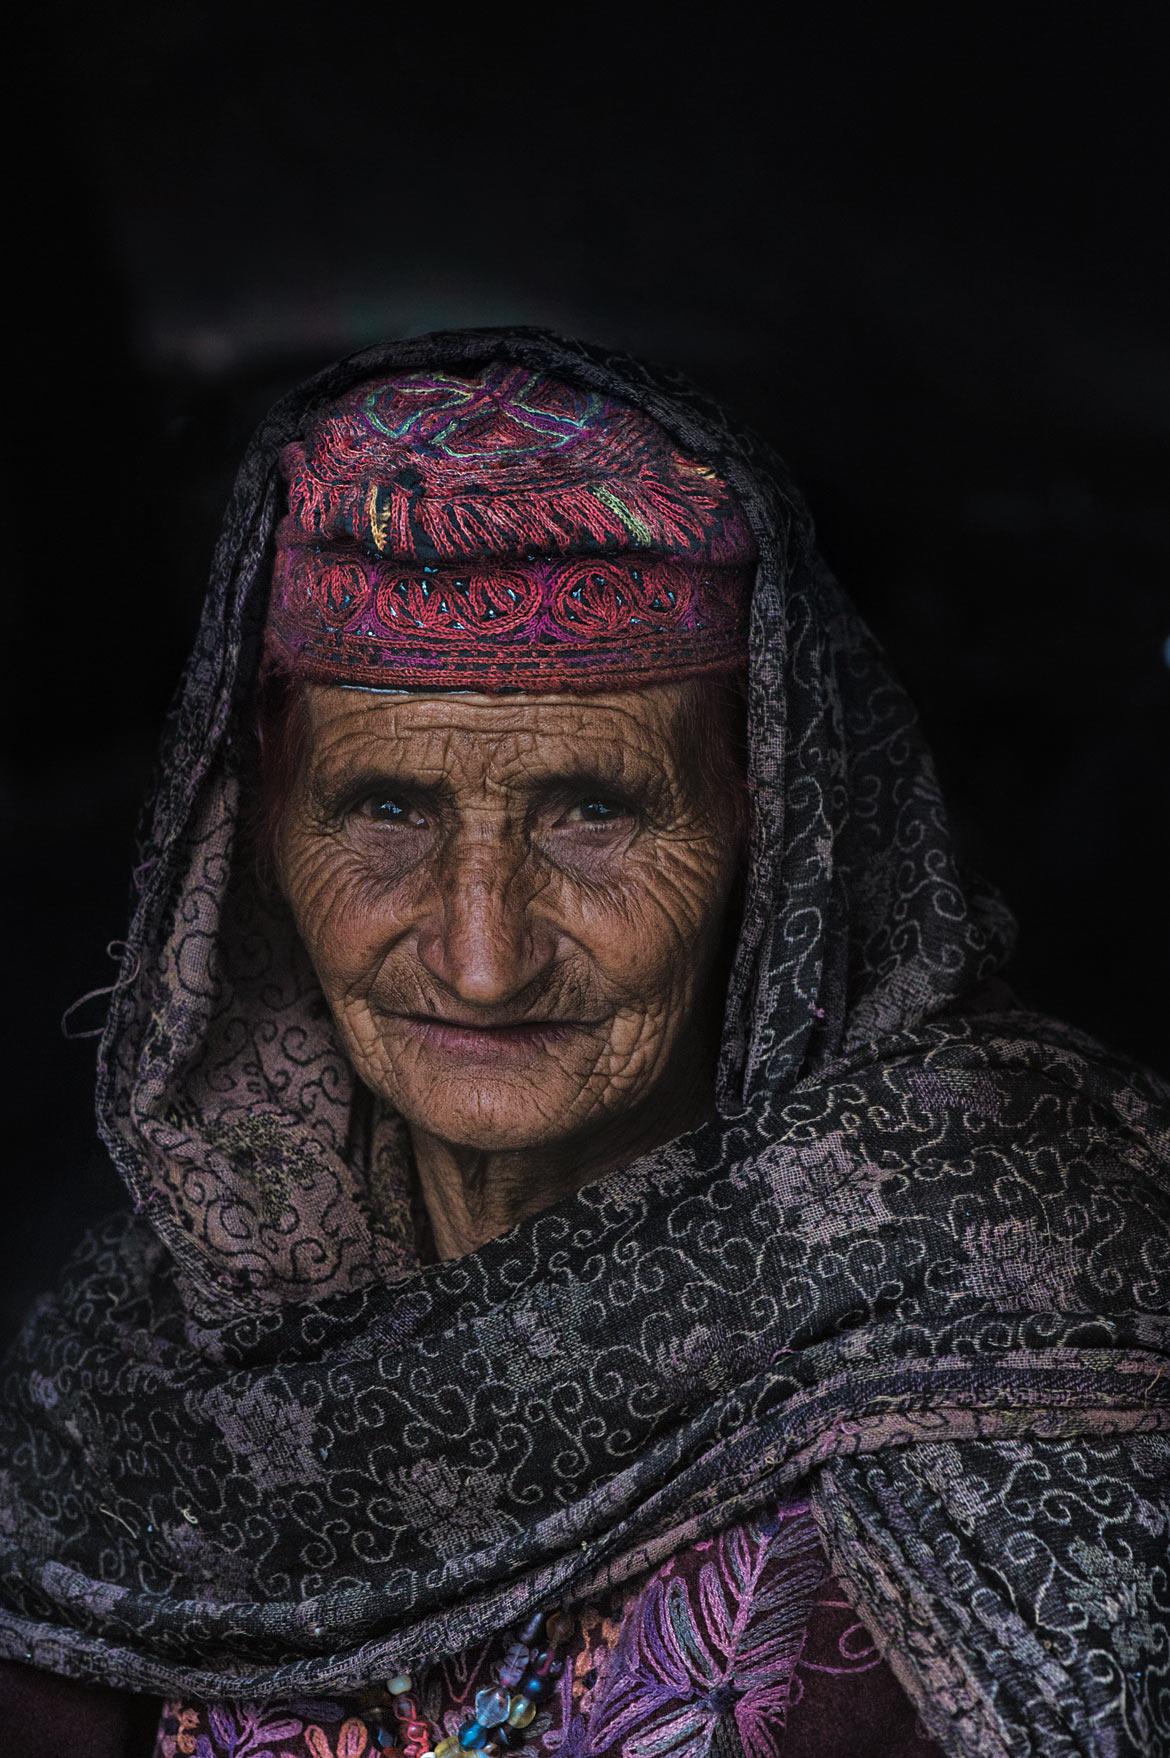 The portrait of an elder